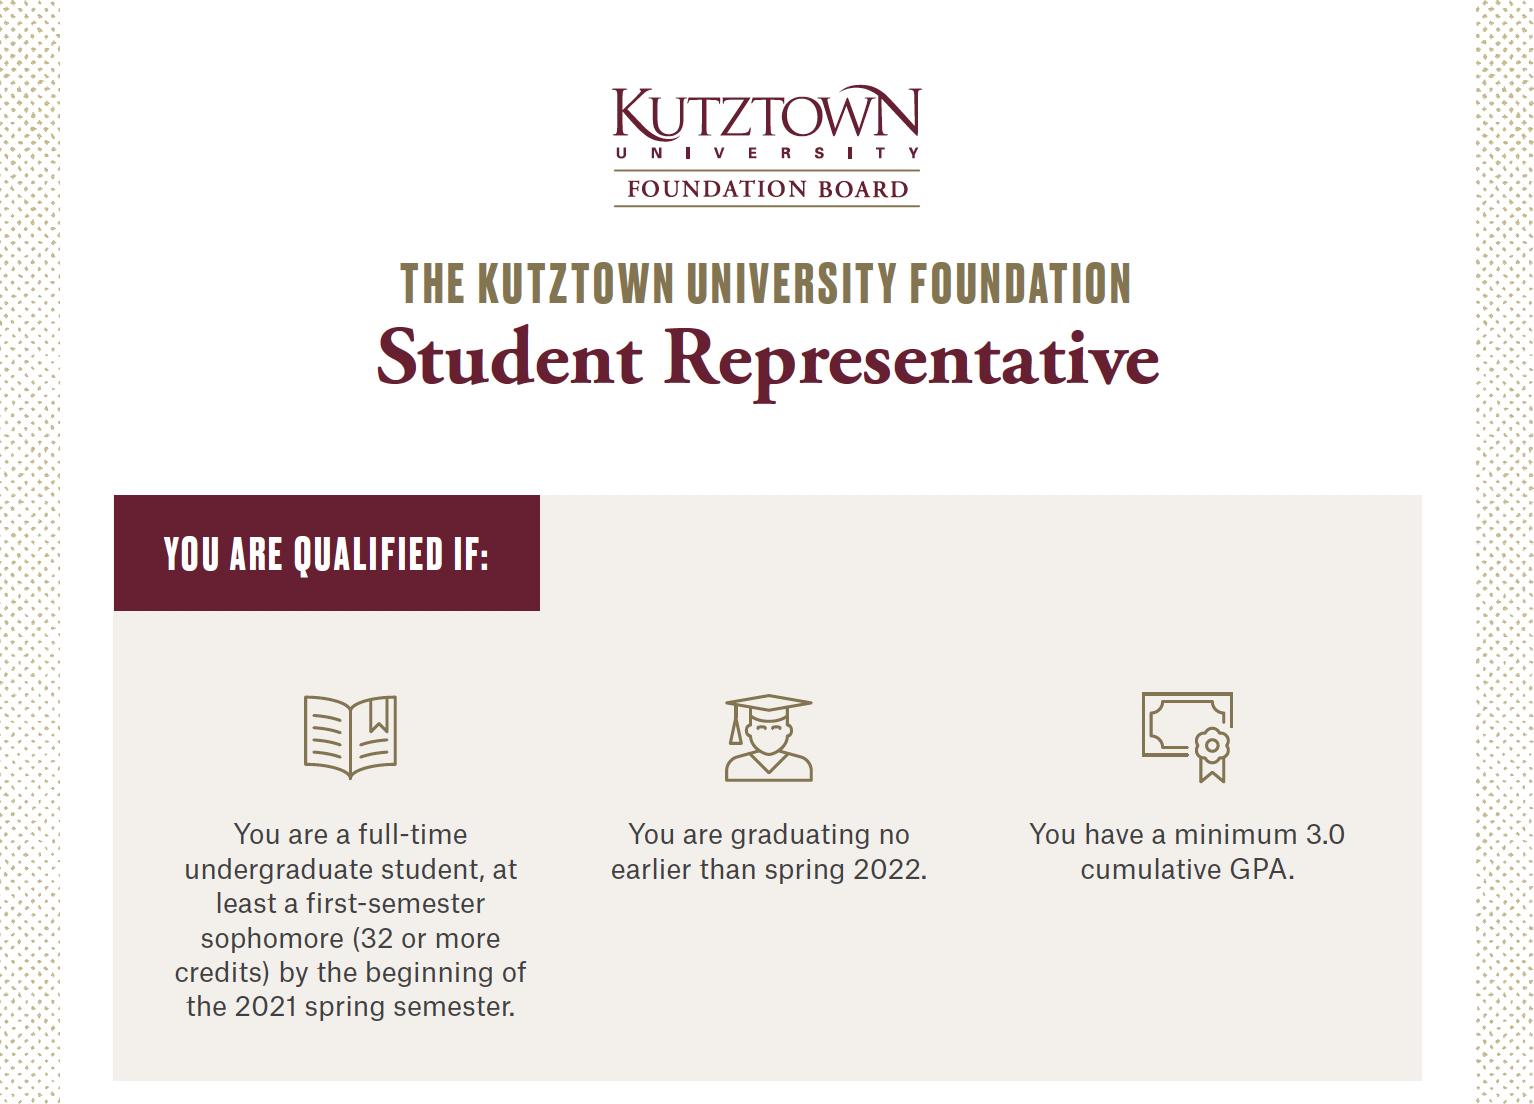 KUF Student Rep